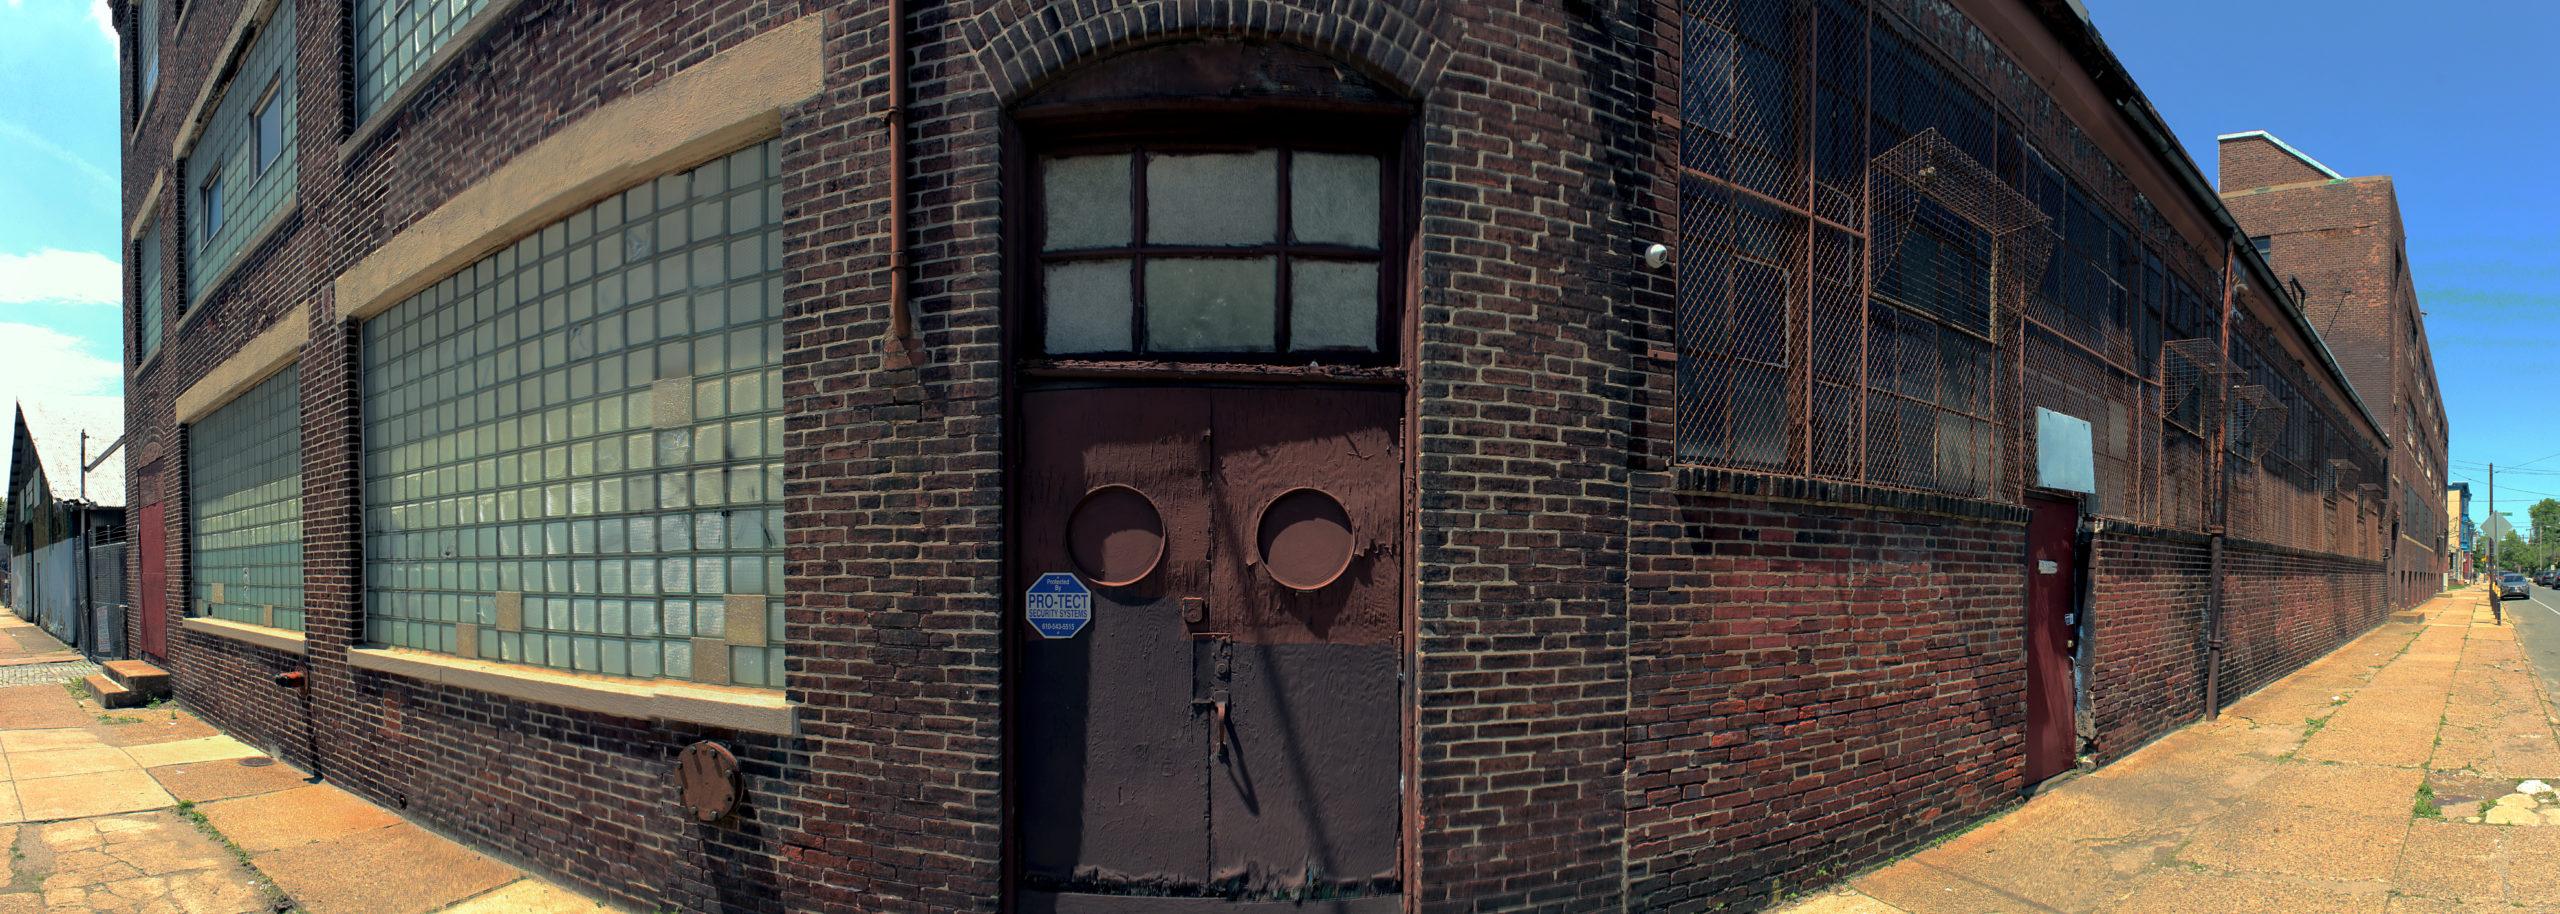 Zitner's 3120 N 17th Street Philadelphia, PA Copyright 2019, Bob Bruhin. All rights reserved.